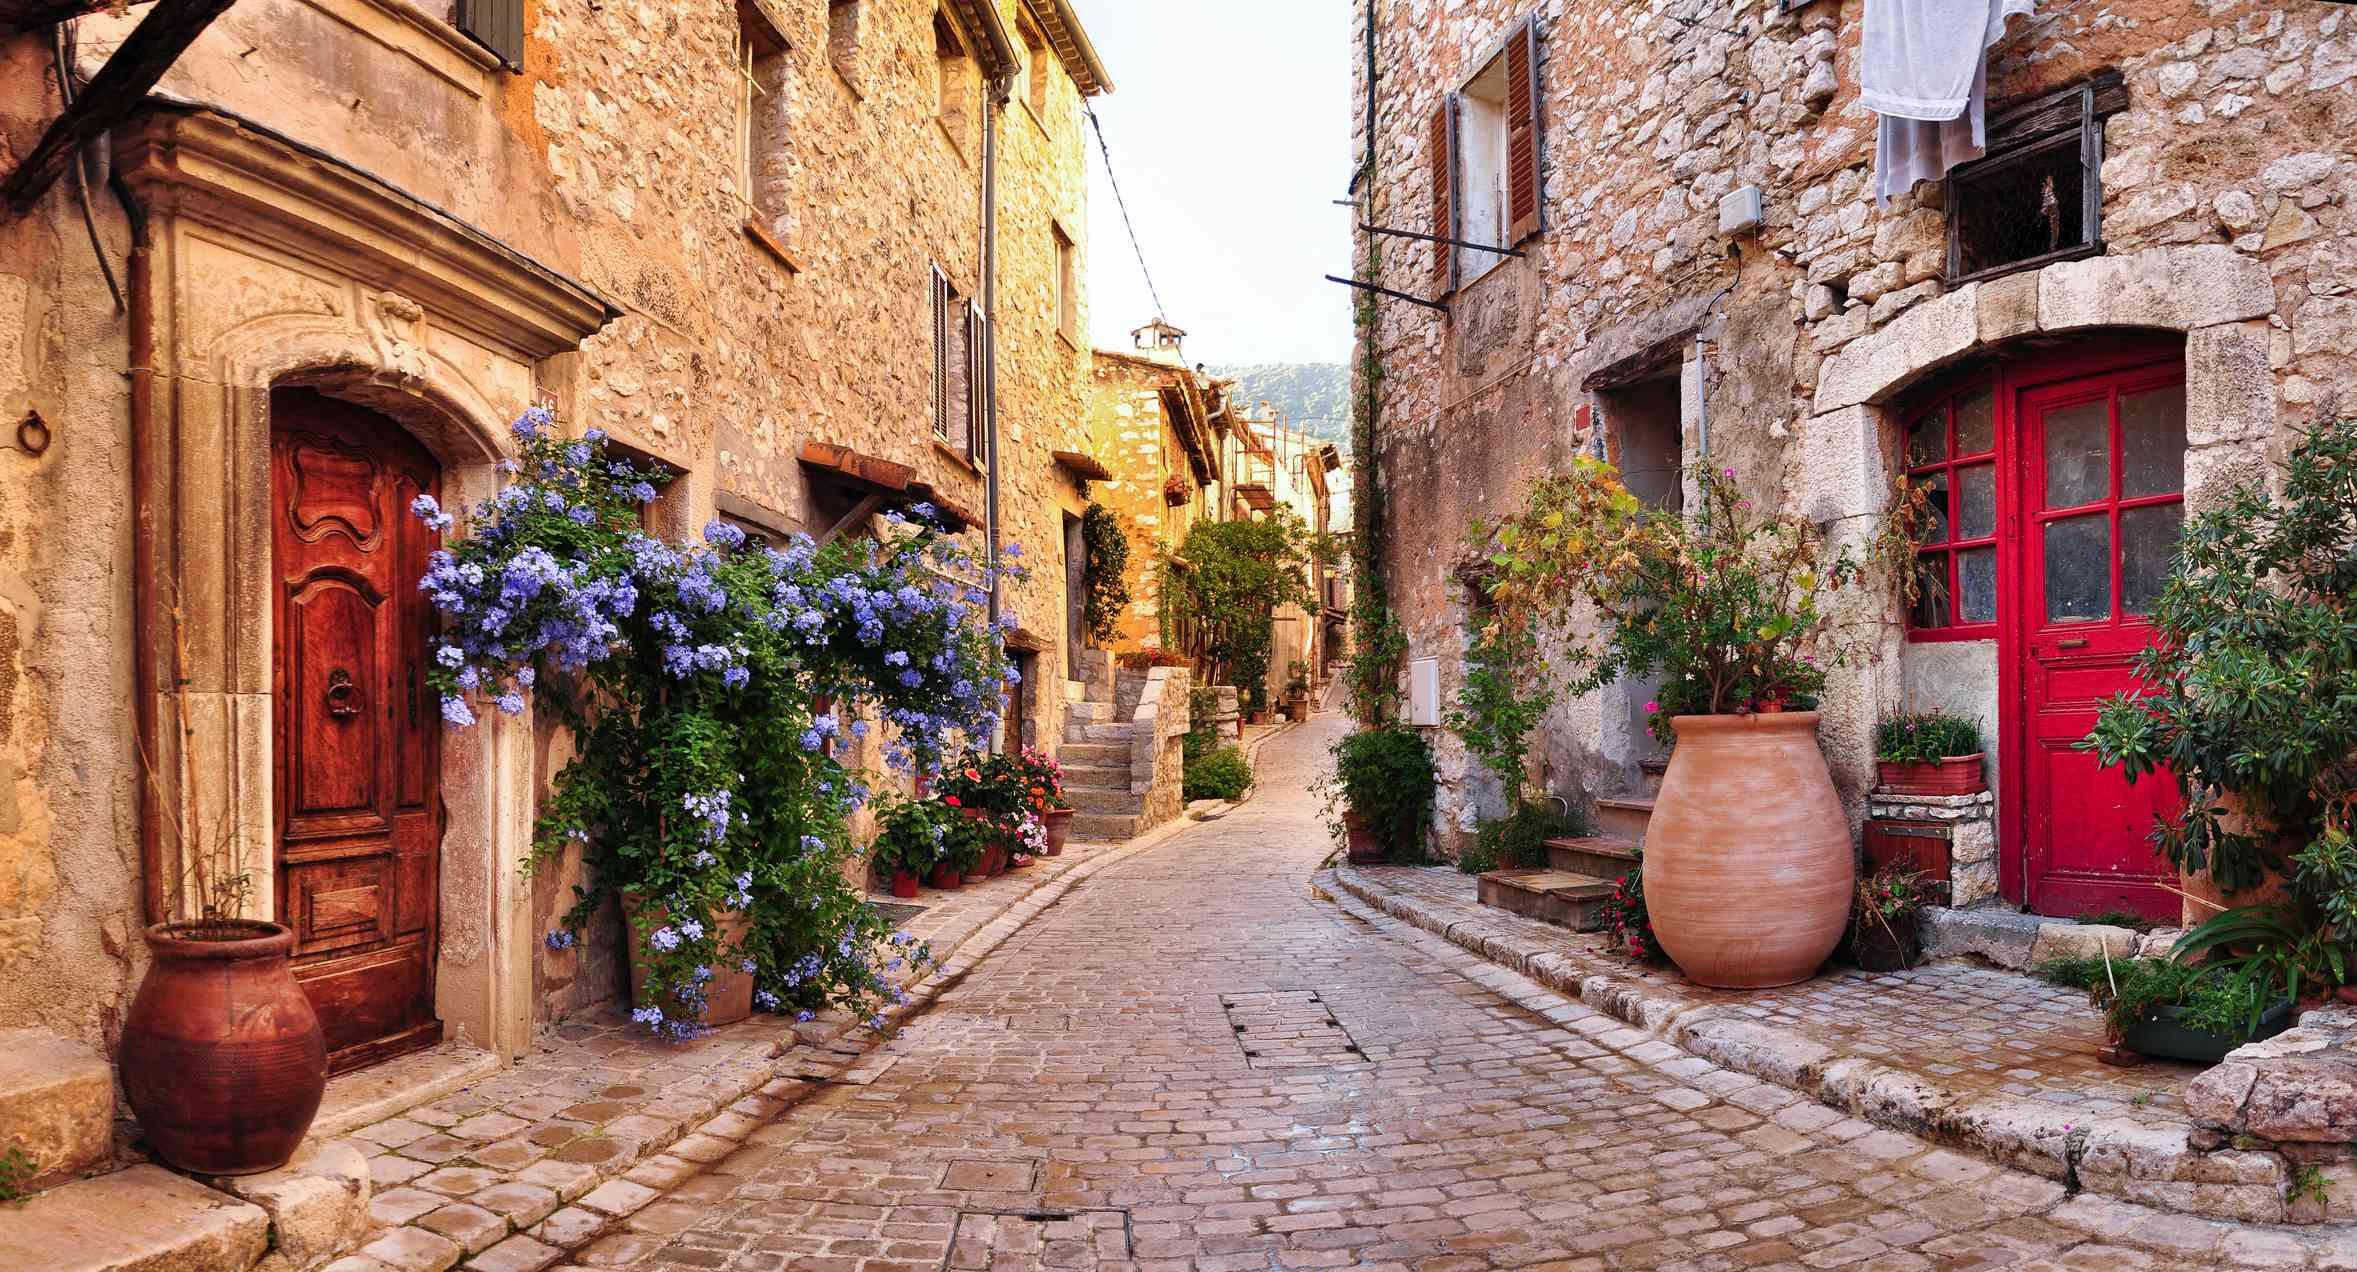 Quiet street in Antibes, France